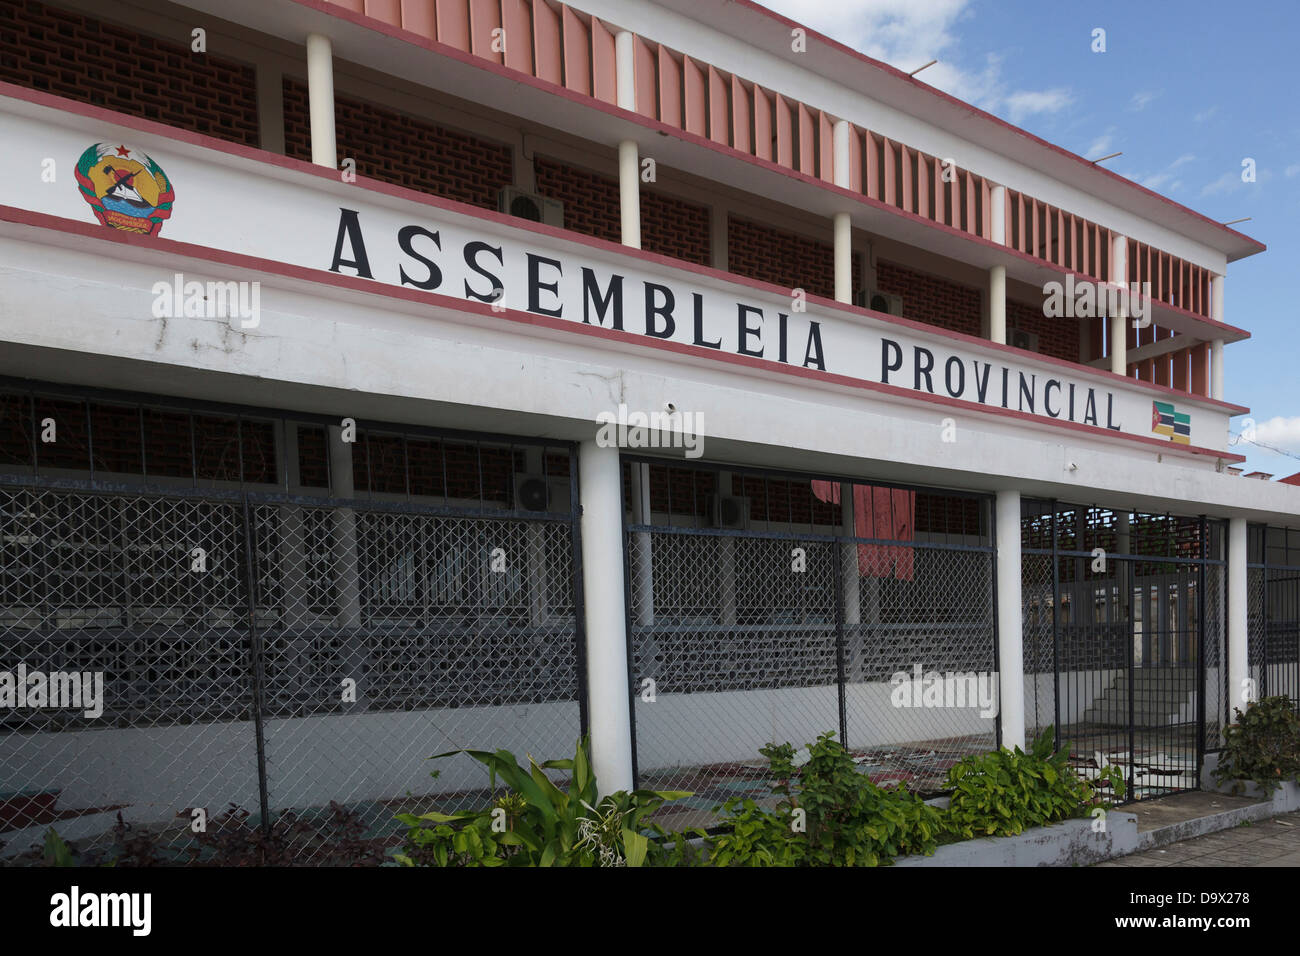 África, Mozambique, Inhambane. Asamblea Provincial. Imagen De Stock